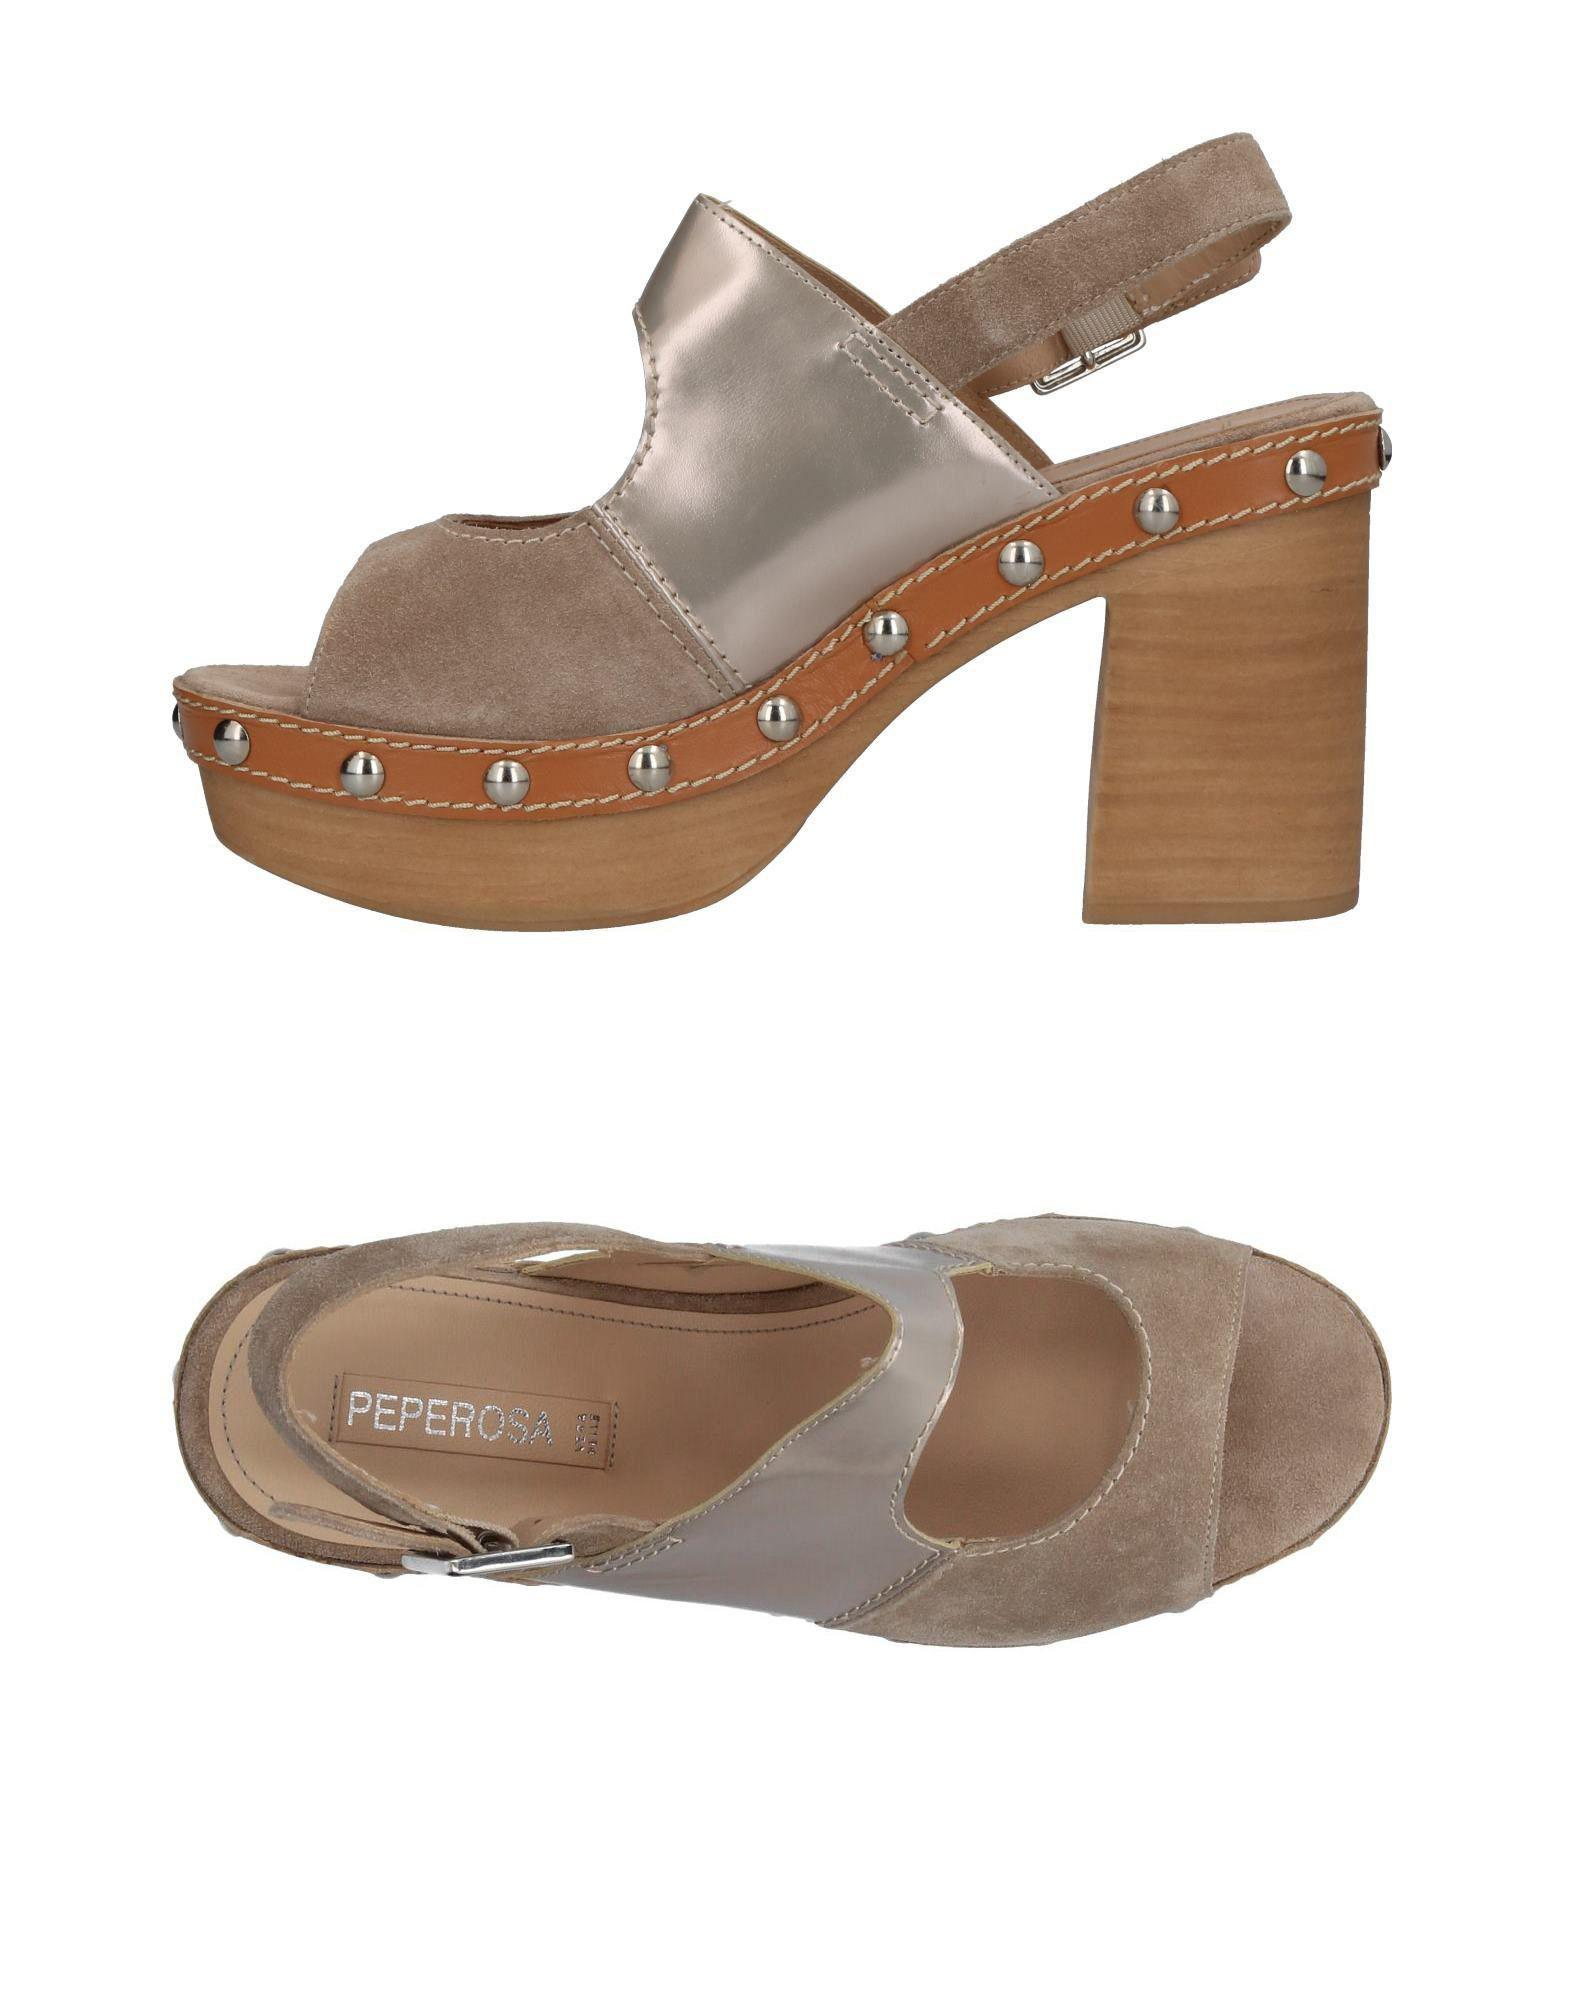 Chaussures - Sandales Entredoigt Carla Saint Barth o0018L